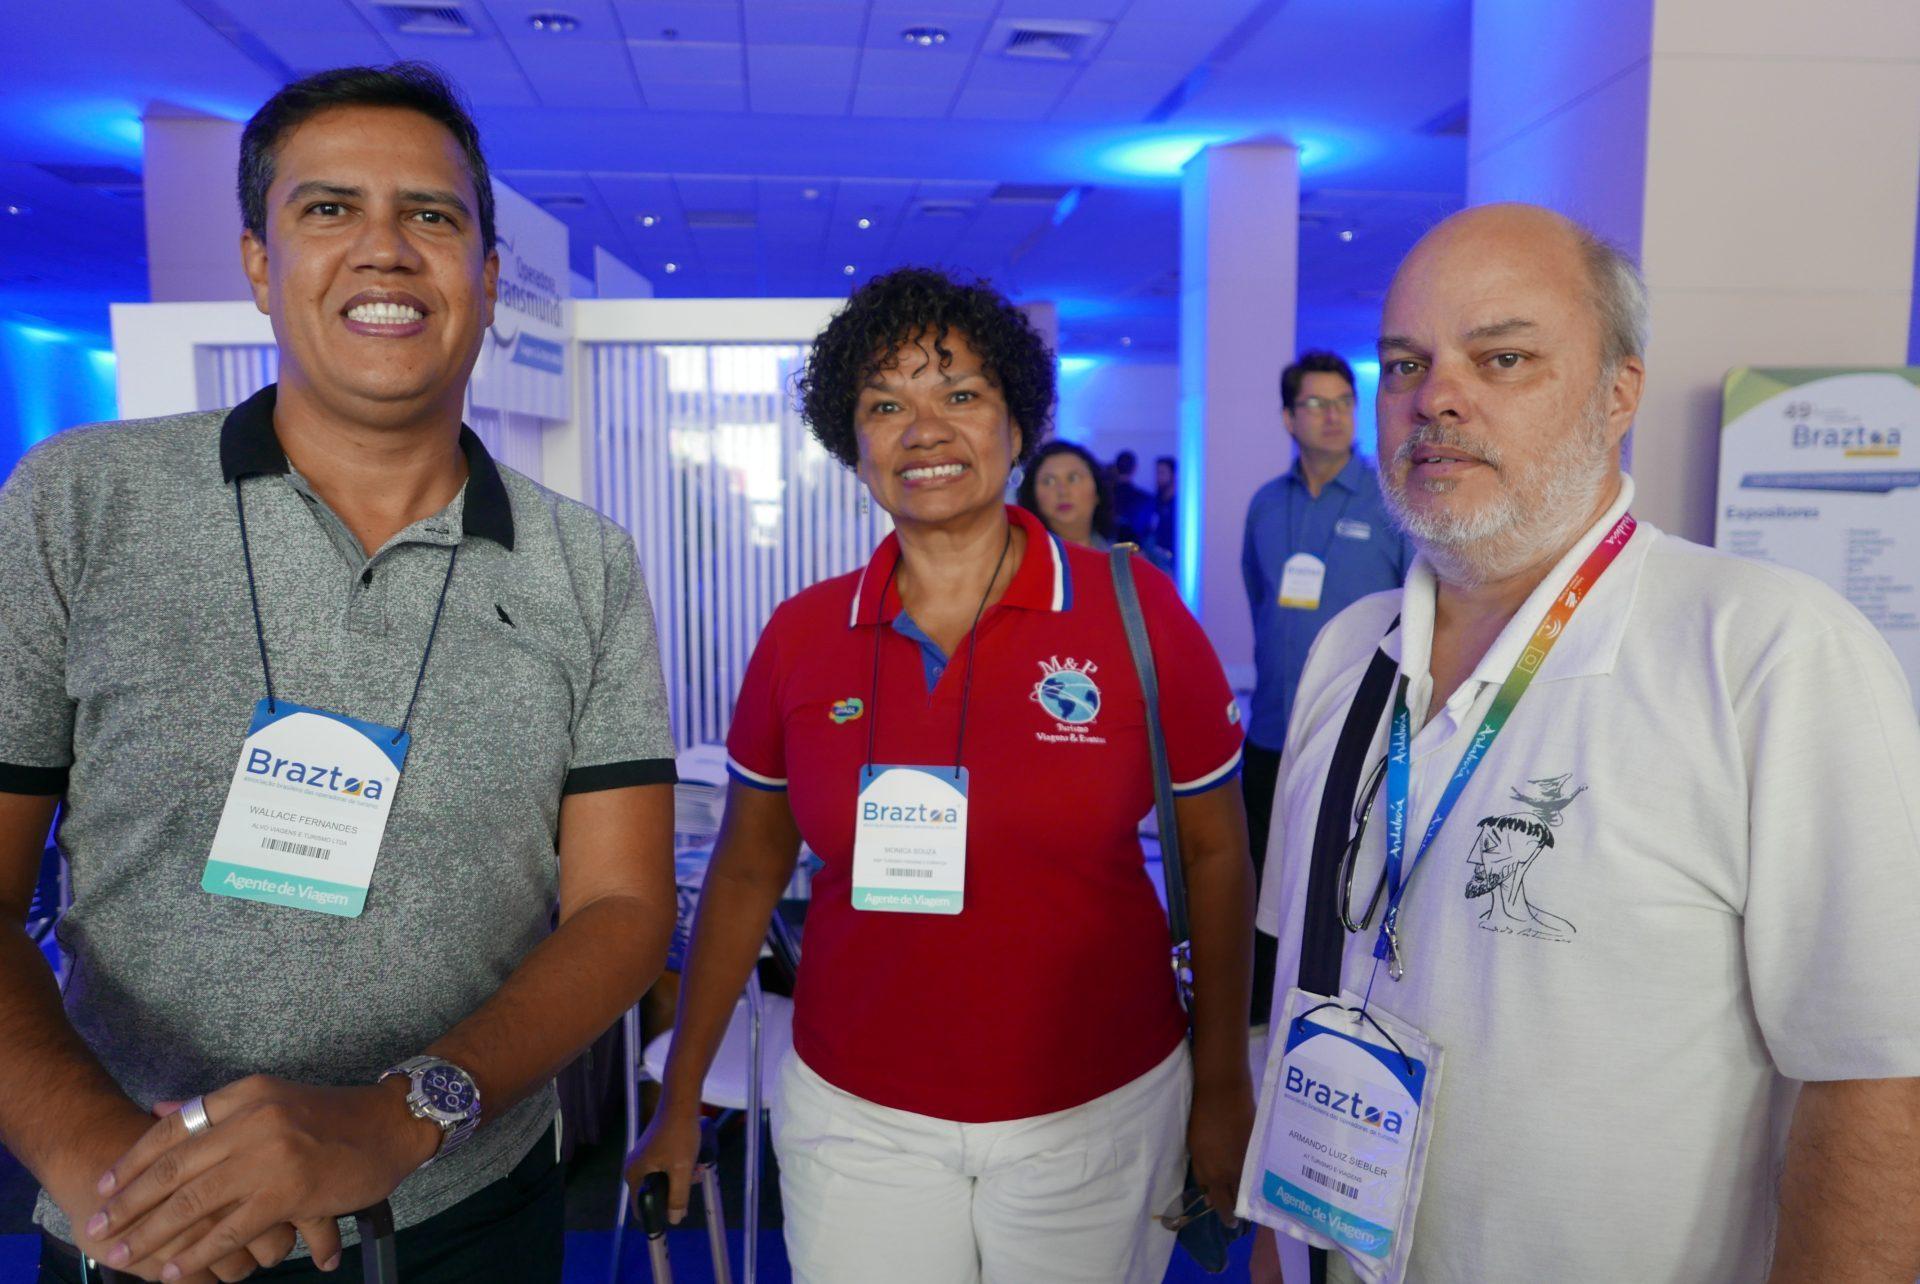 Wallace Fernandes, da Alvo Viagens; Monika Souza, da M&P Turismo; e Armando Siebler, da A1 Turismo